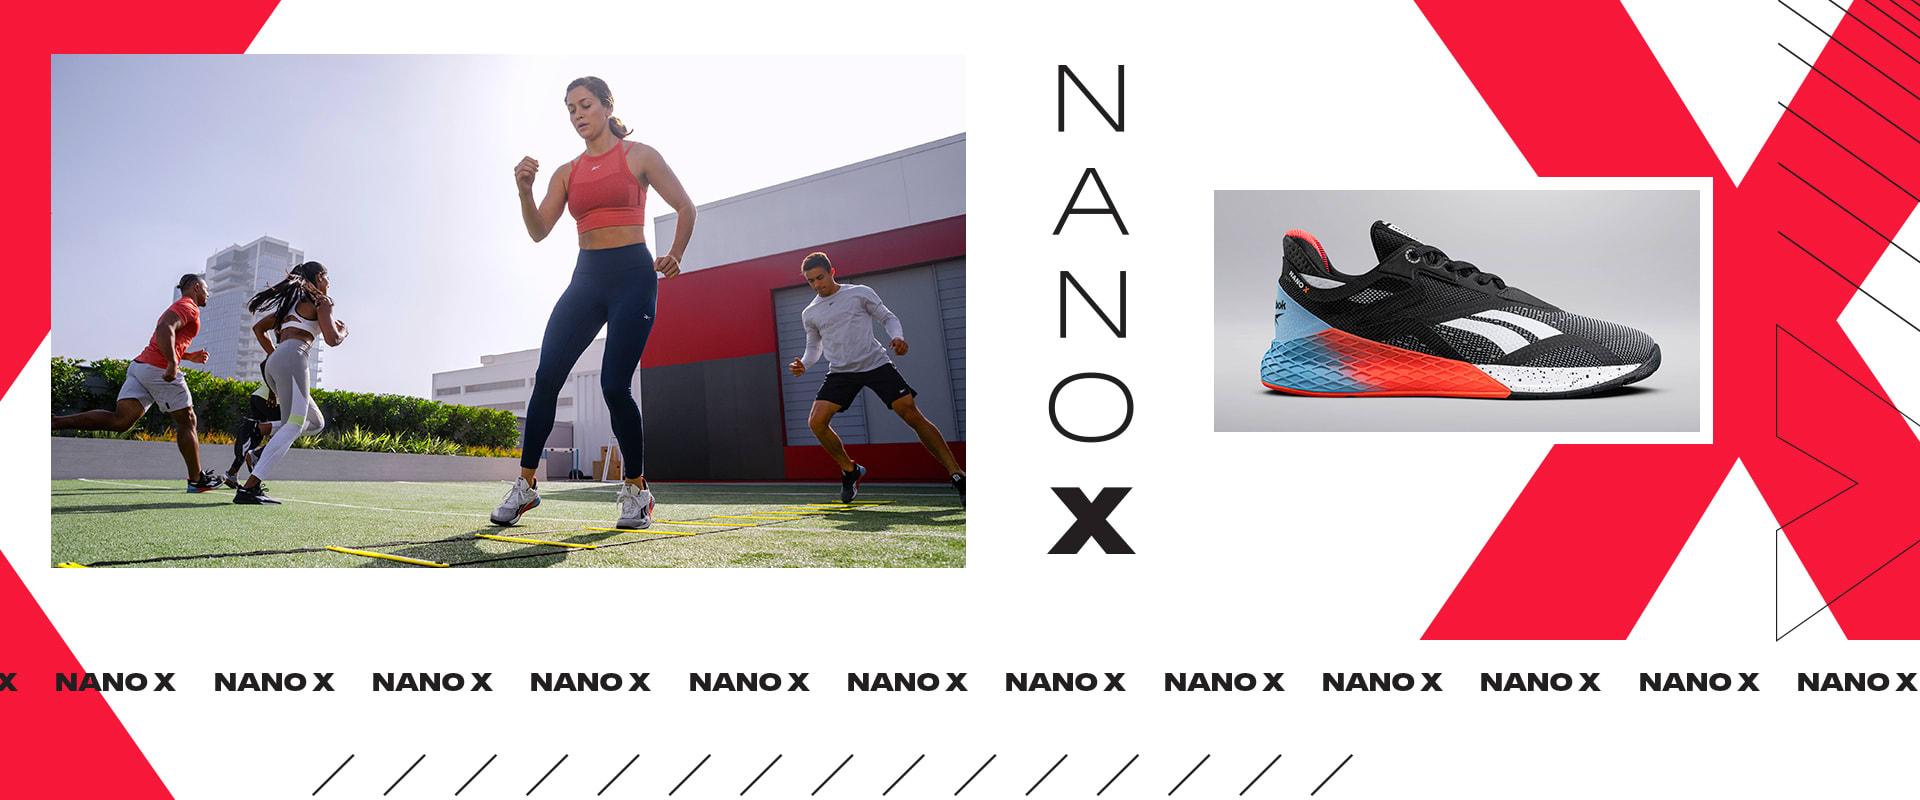 Reebok crossfit nano 4.0 Cross fit Fitness Gym Training zapato rojo zapatos talla 36